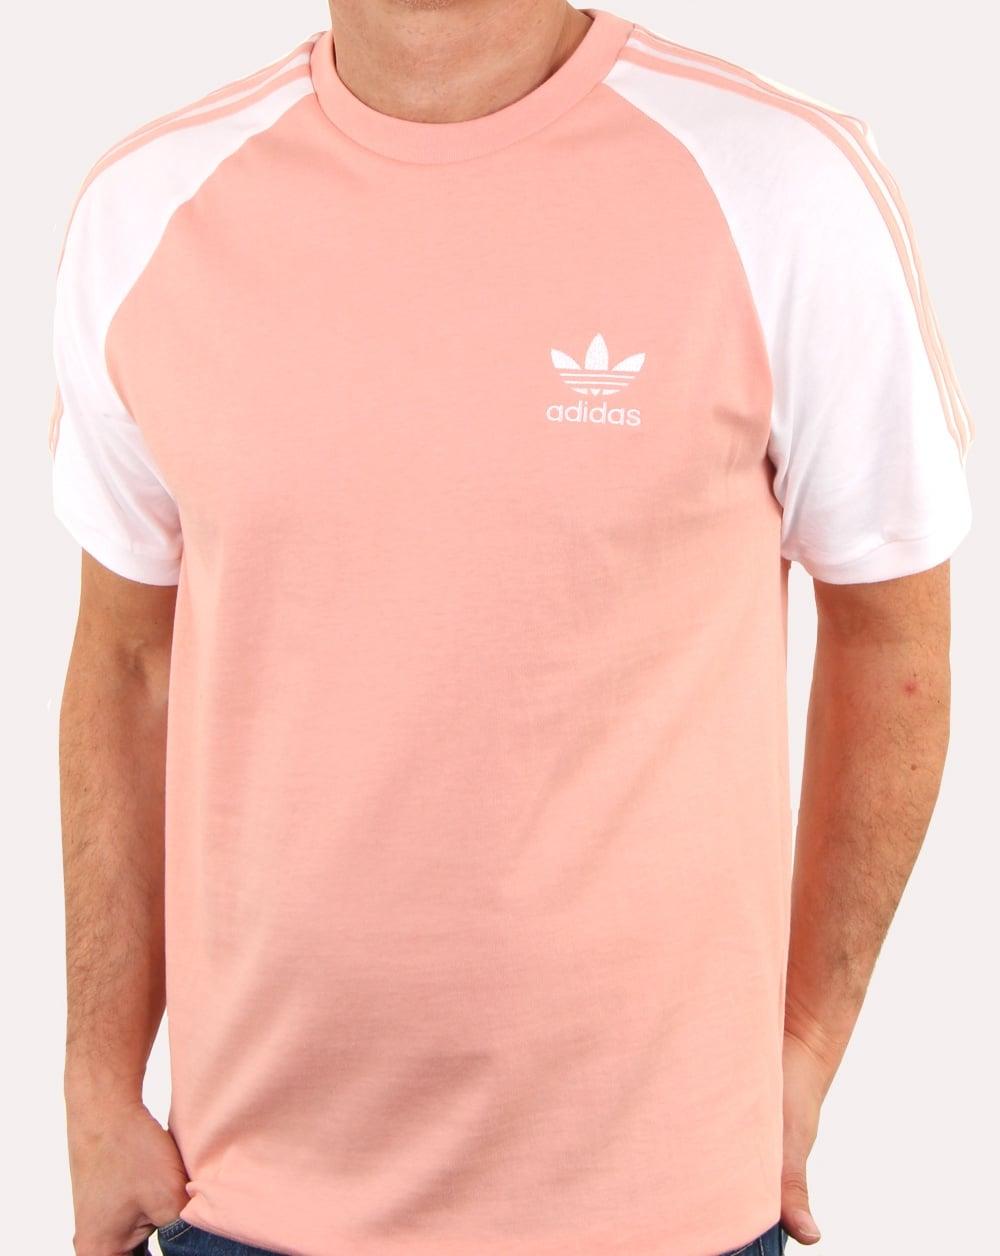 Adidas Originals 3 Stripes T Shirt Dust Pink